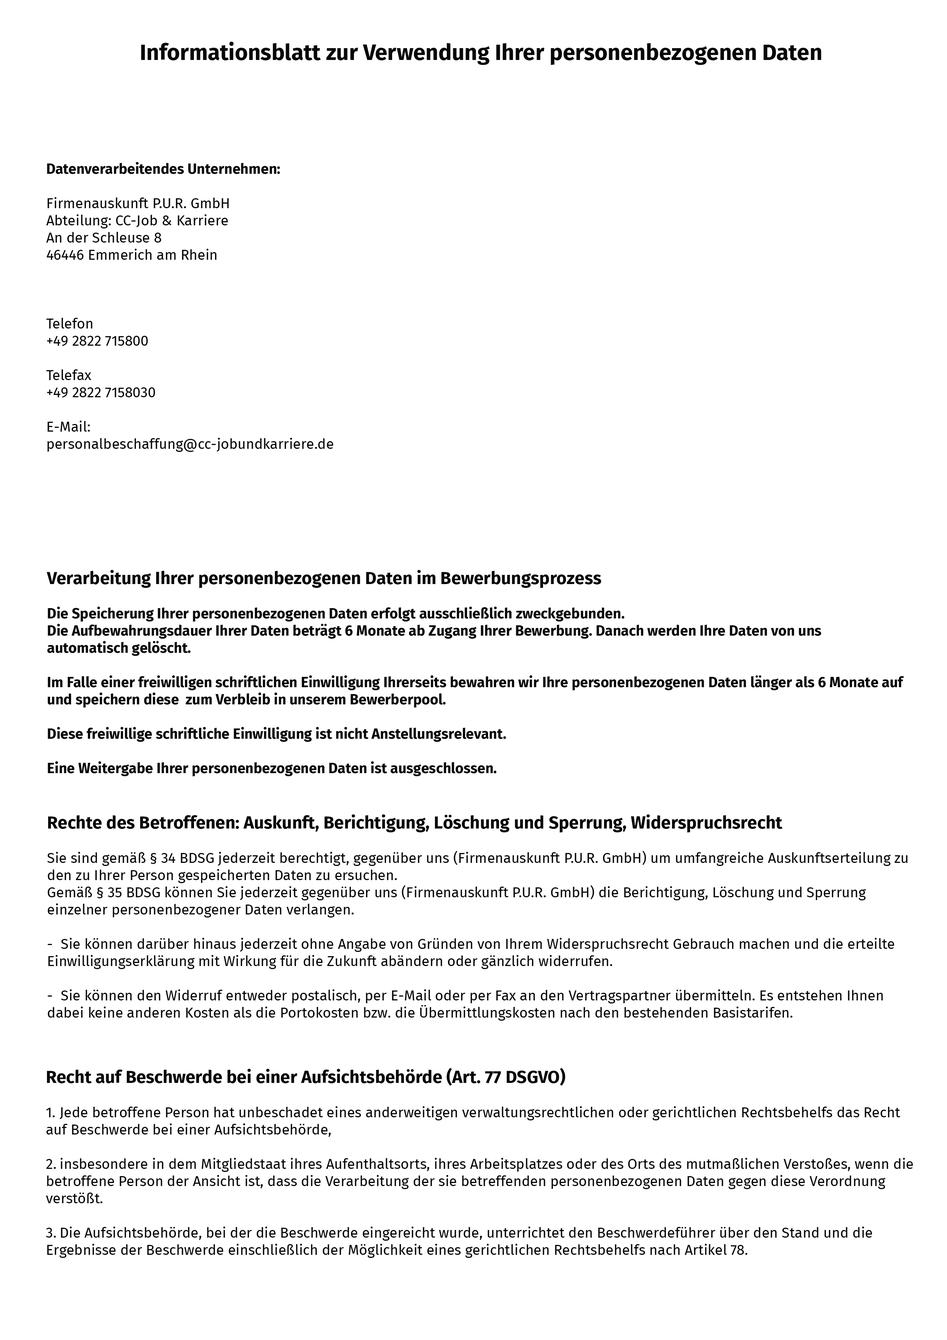 Bewerbung Berwerberdaten I Datenschutz 2021 2